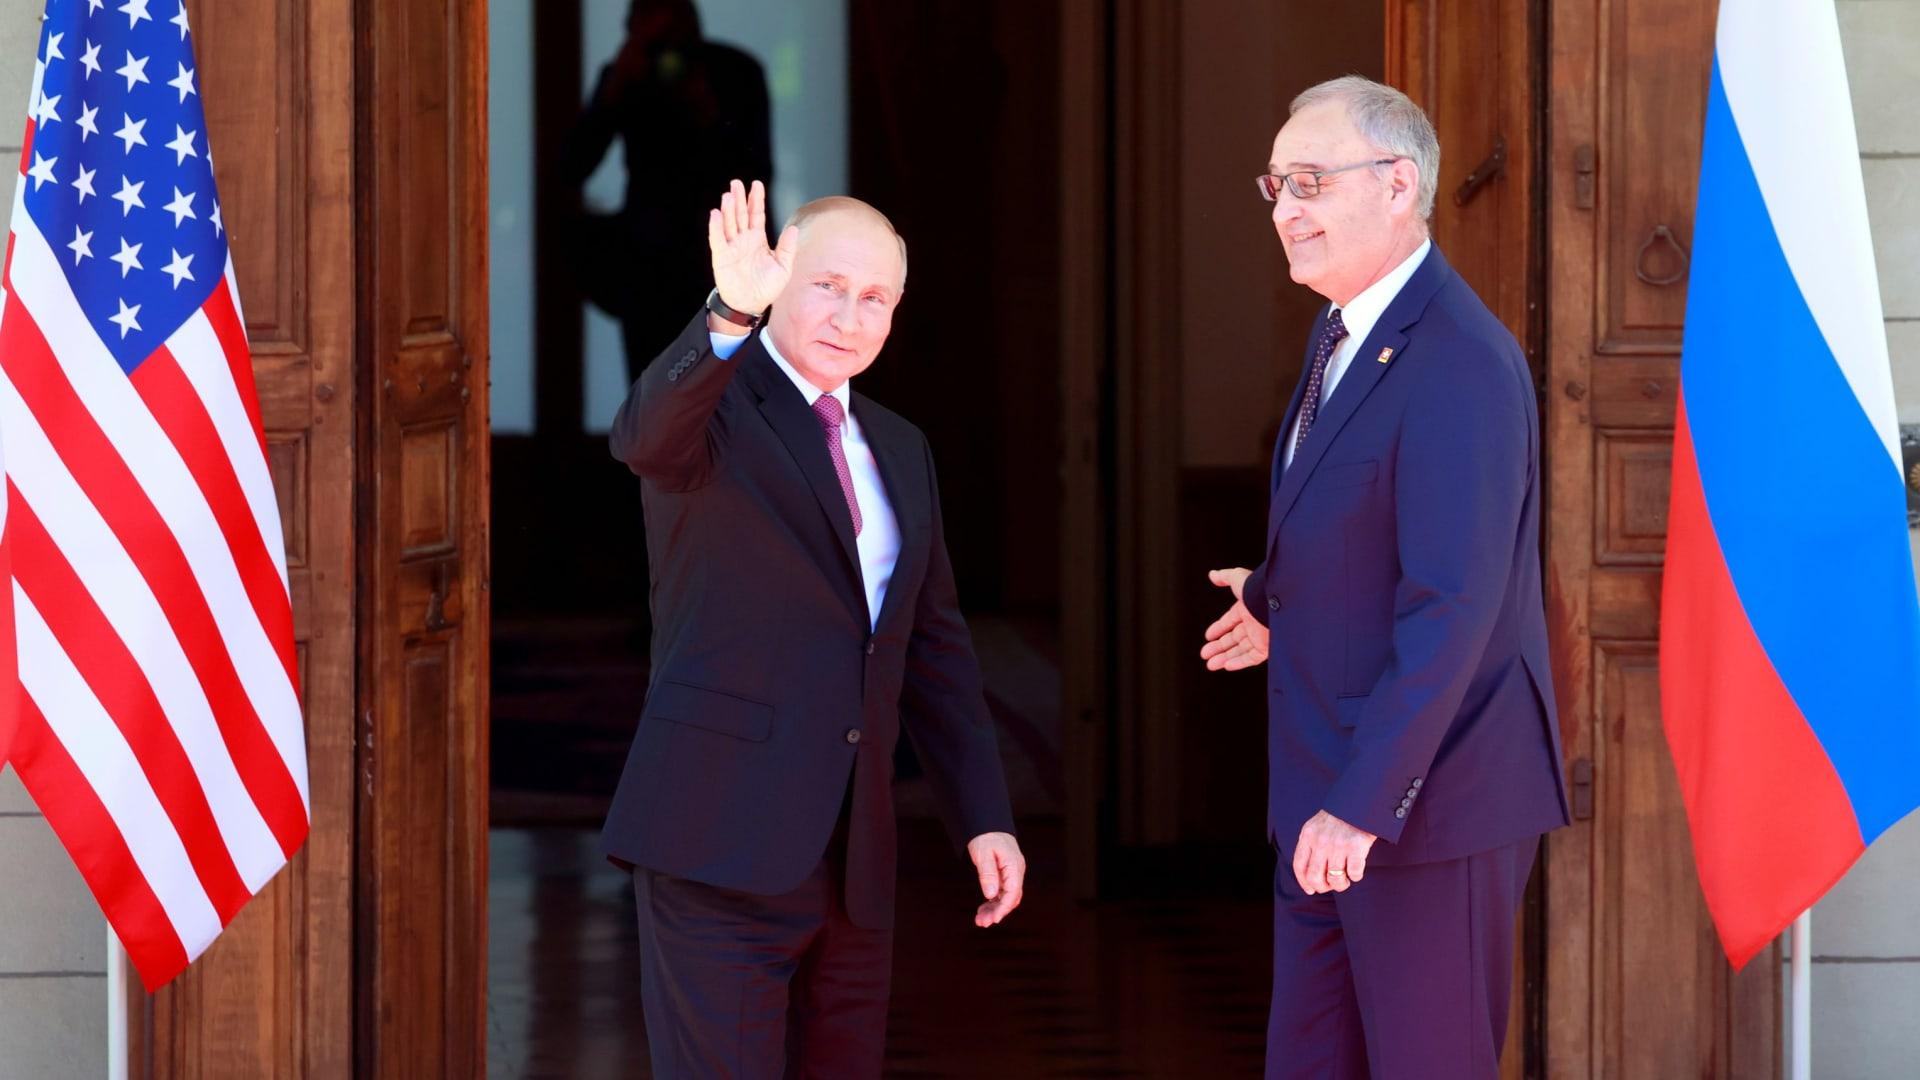 Russia's President Vladimir Putin waves next to Swiss President Guy Parmelin as he arrives at Villa La Grange for the U.S.-Russia summit, in Geneva, Switzerland, June 16, 2021.